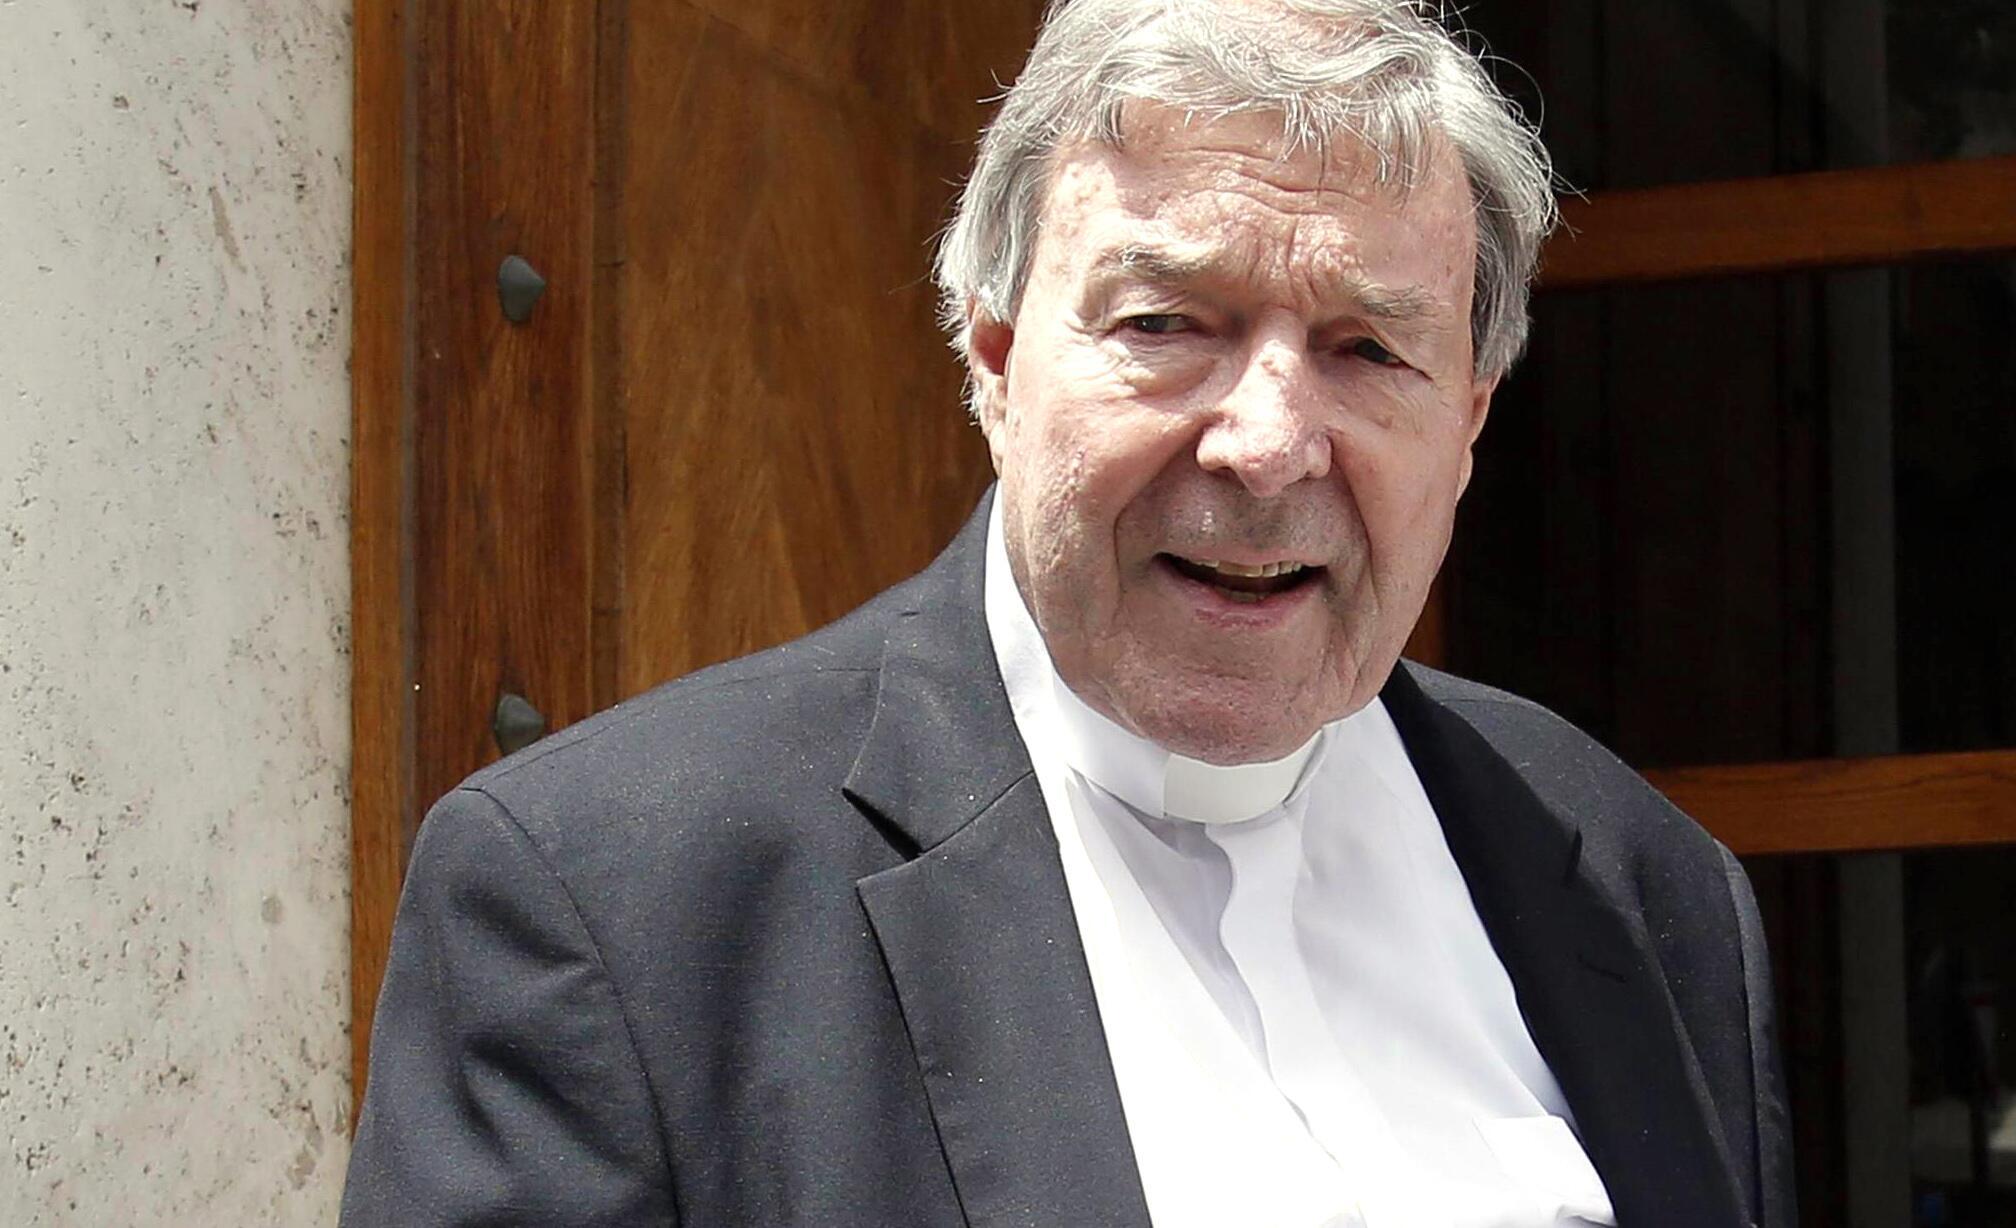 Bild zu Sechs Jahre Haft für Kardinal Pell wegen sexuellen Missbrauchs